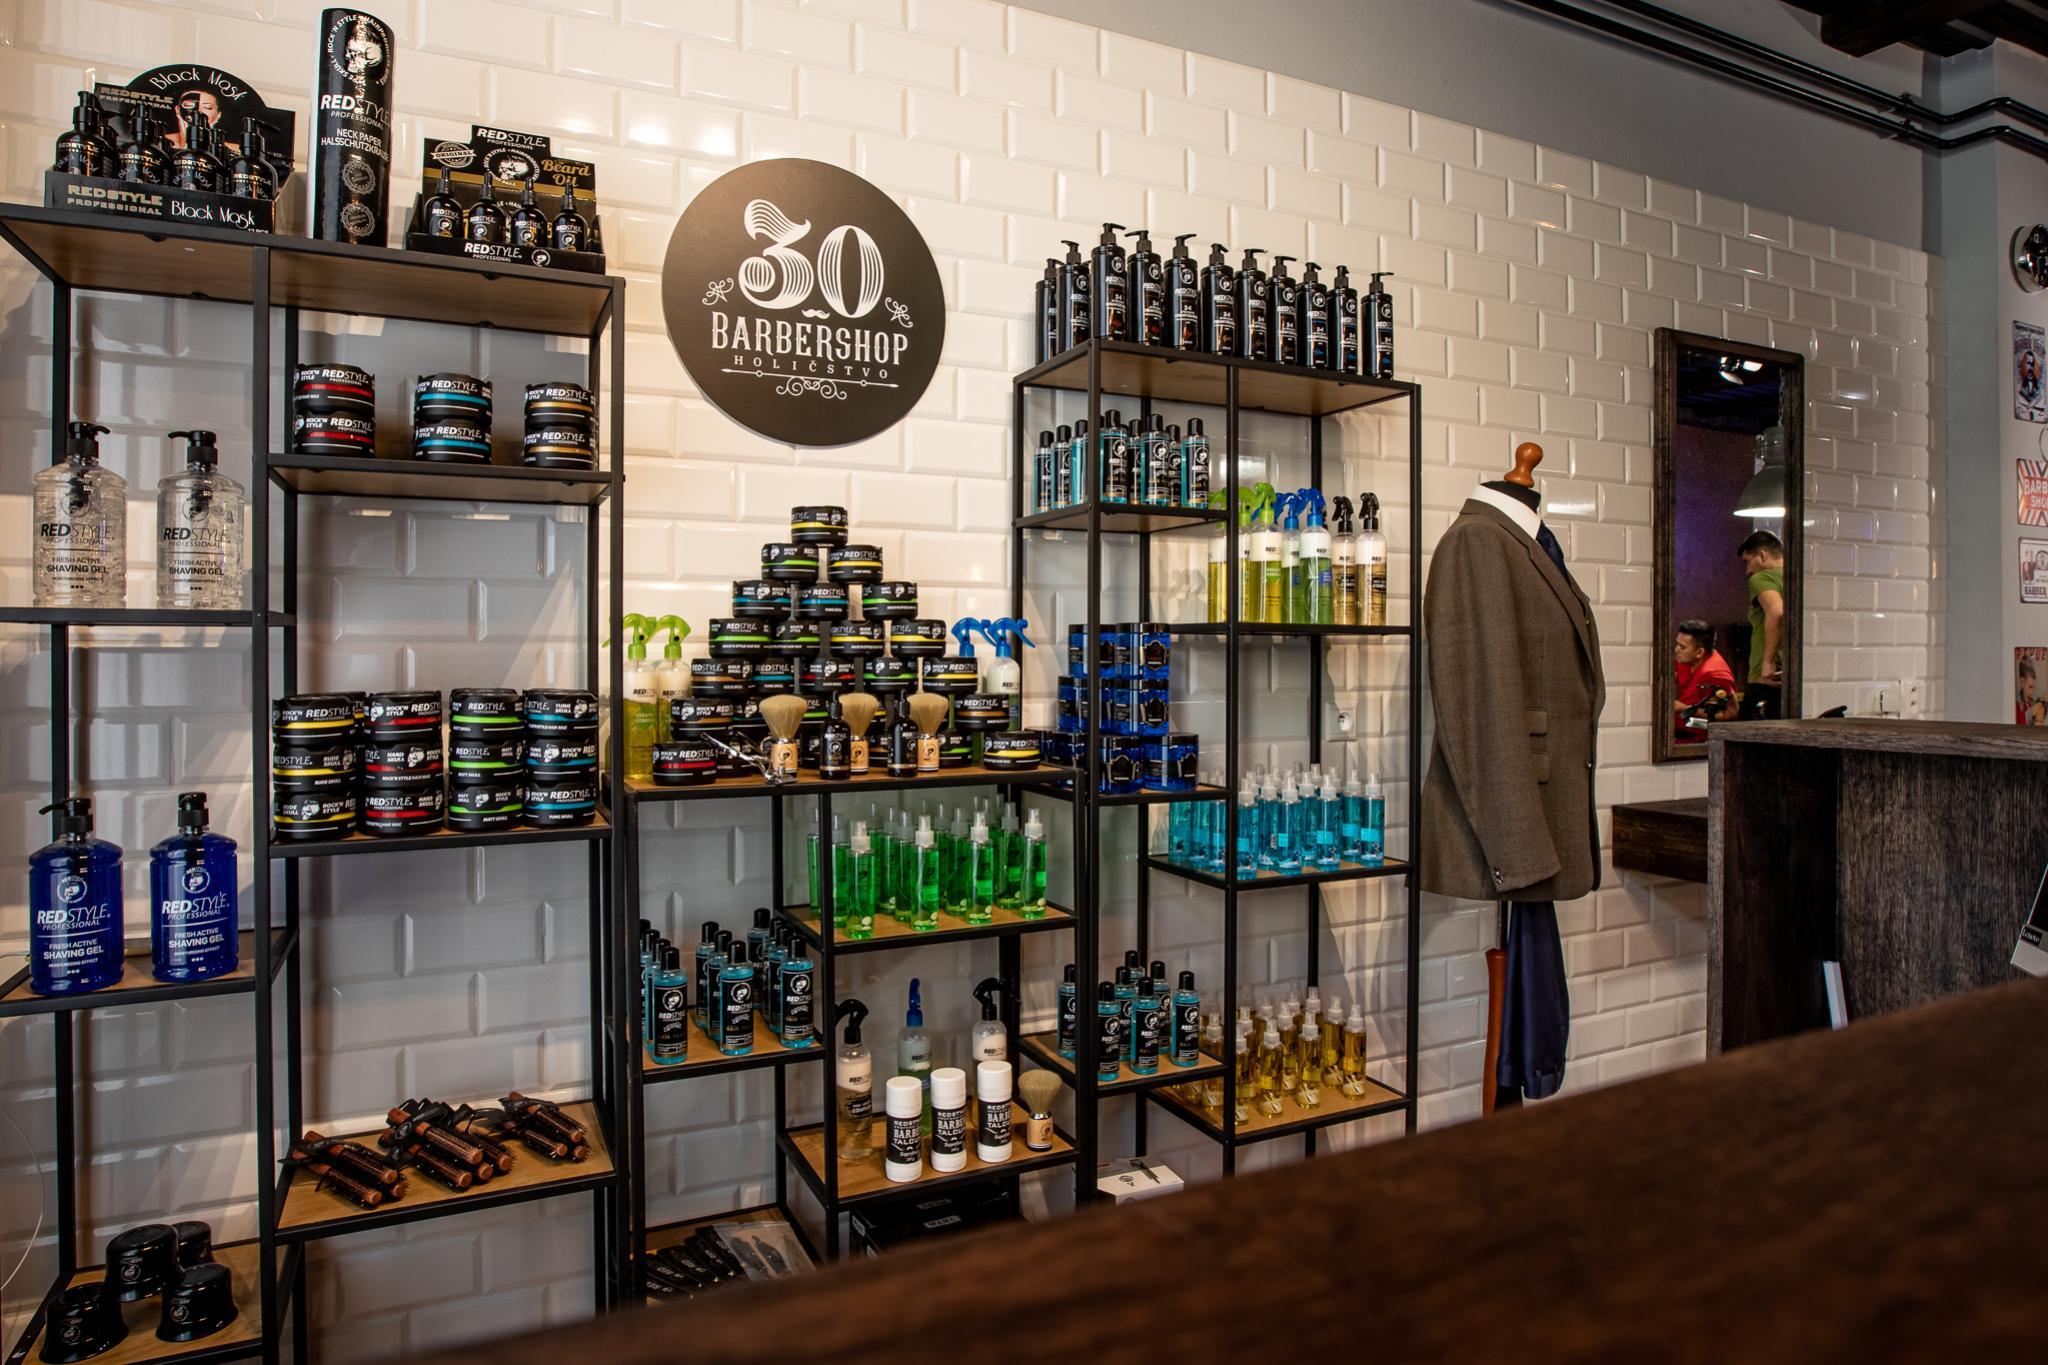 profesionalna starostlivost a relax barbershop30